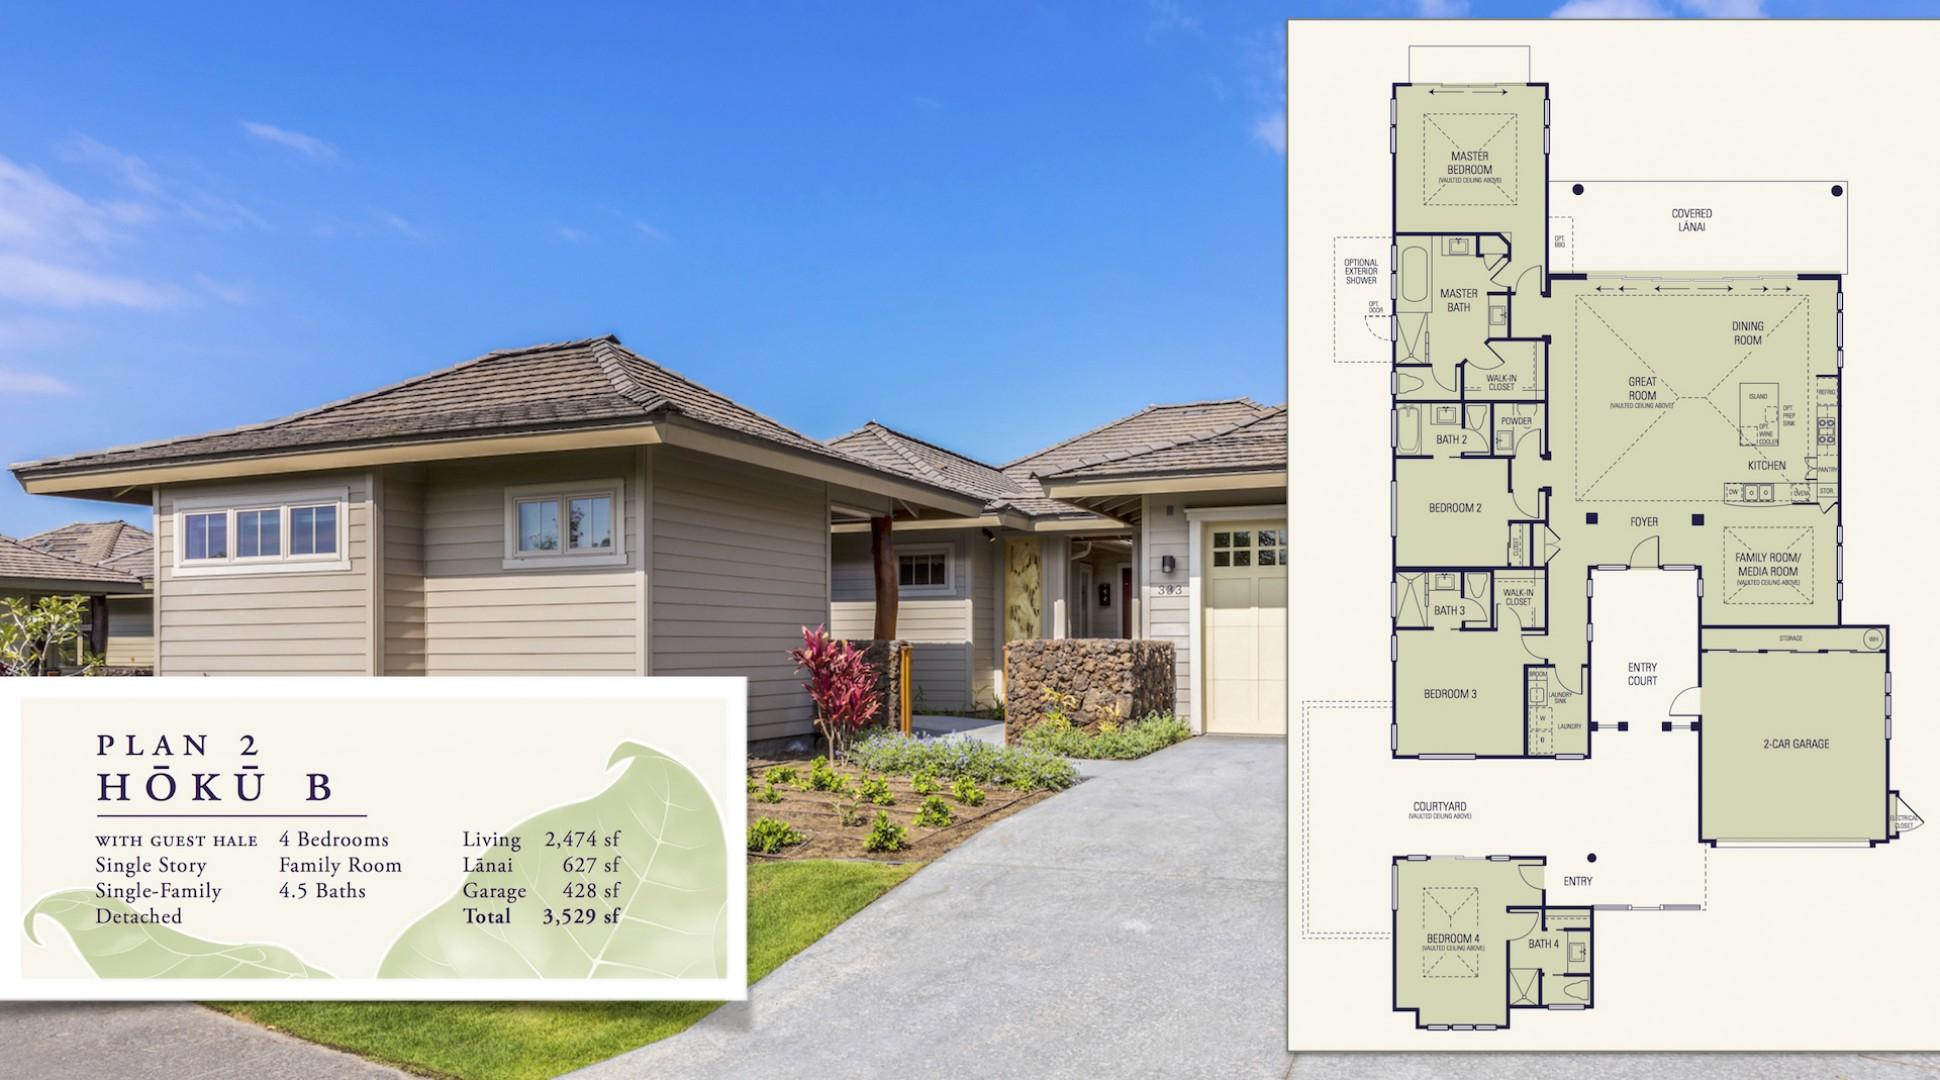 Estate home floor plan, overlaid on driveway.